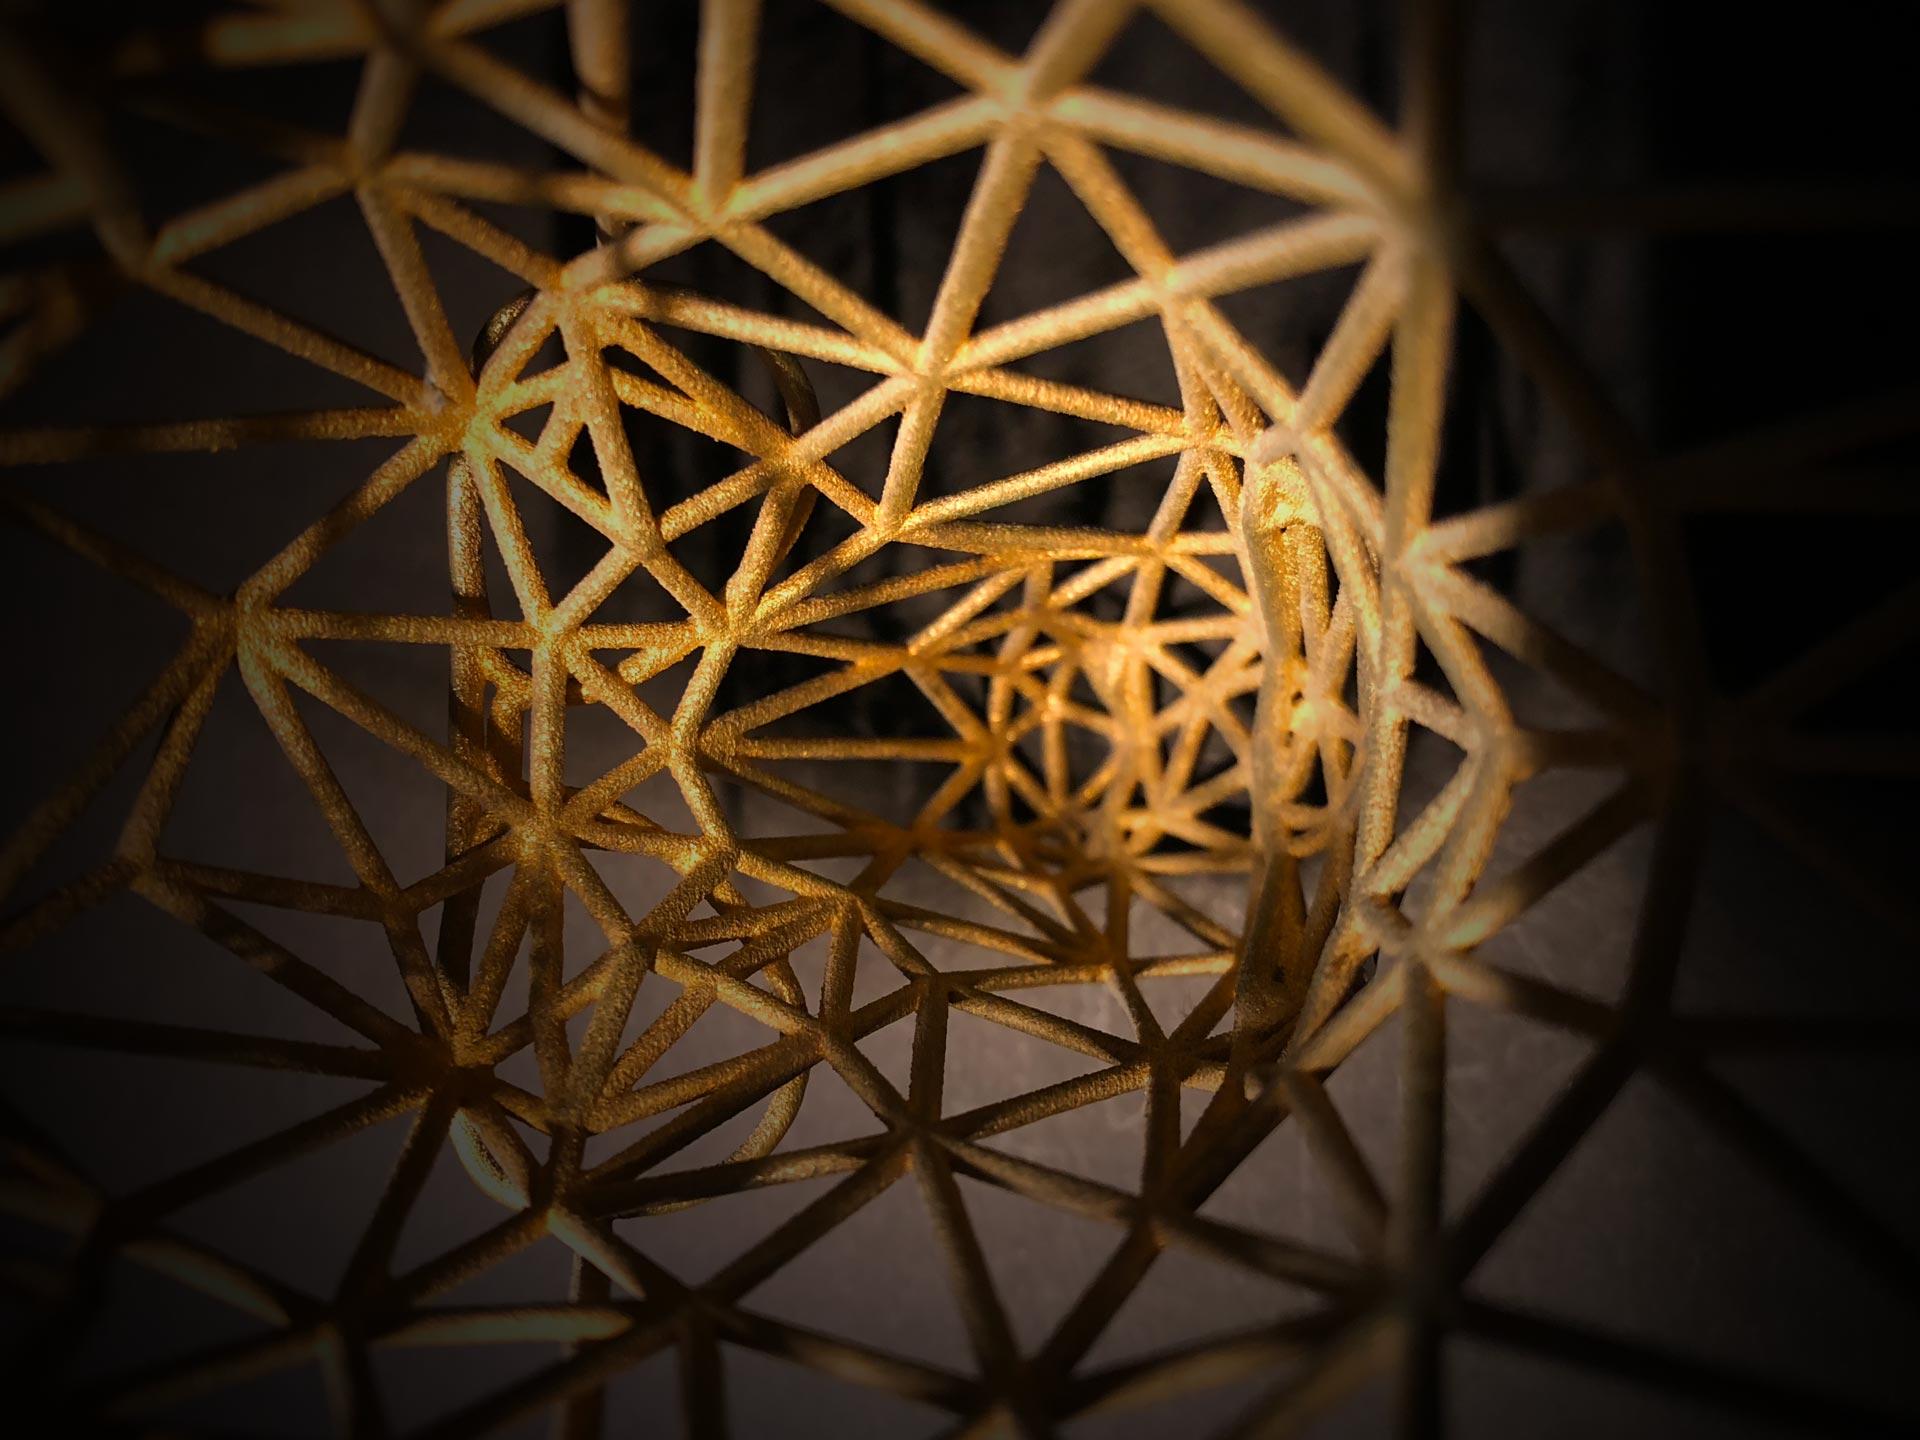 fusione metalli 3d